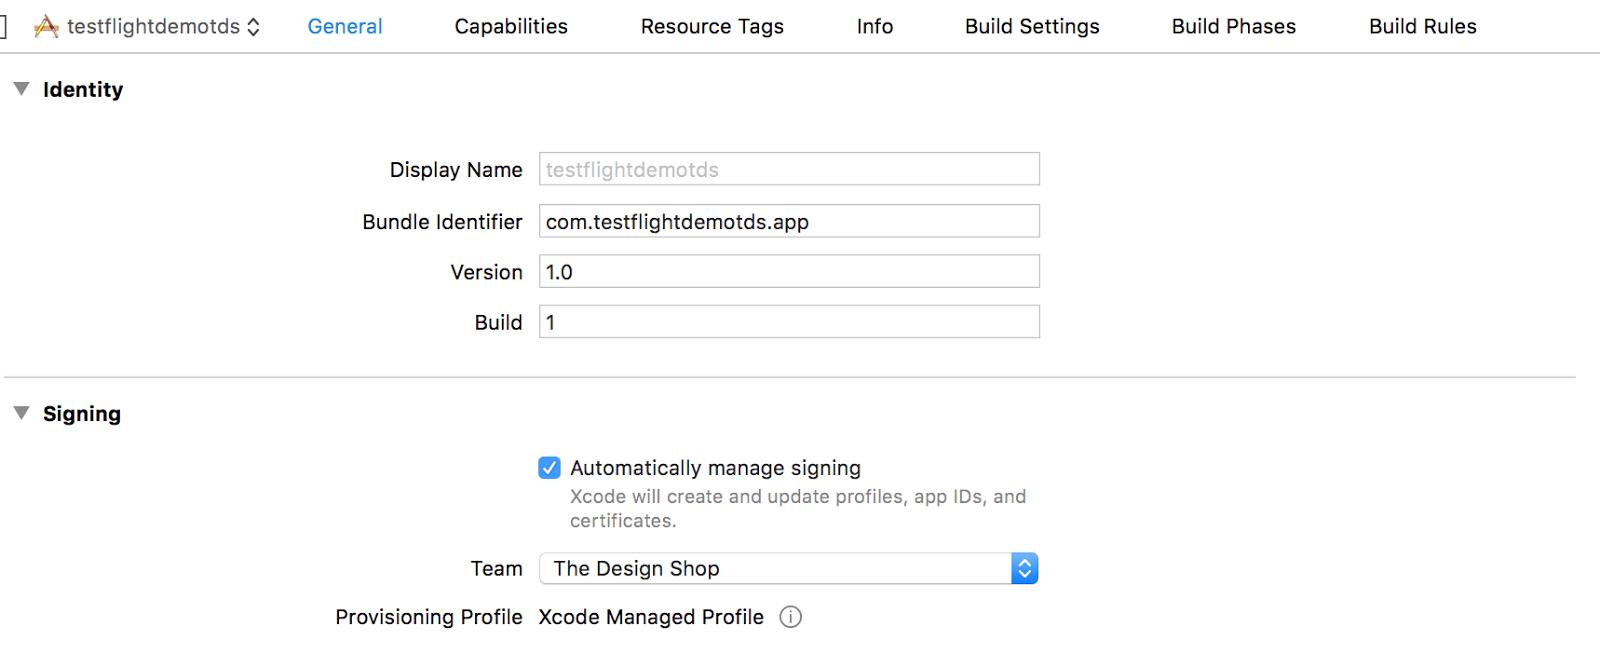 Step By Step Guide on iOS TestFlight Beta Testing – Hiren's